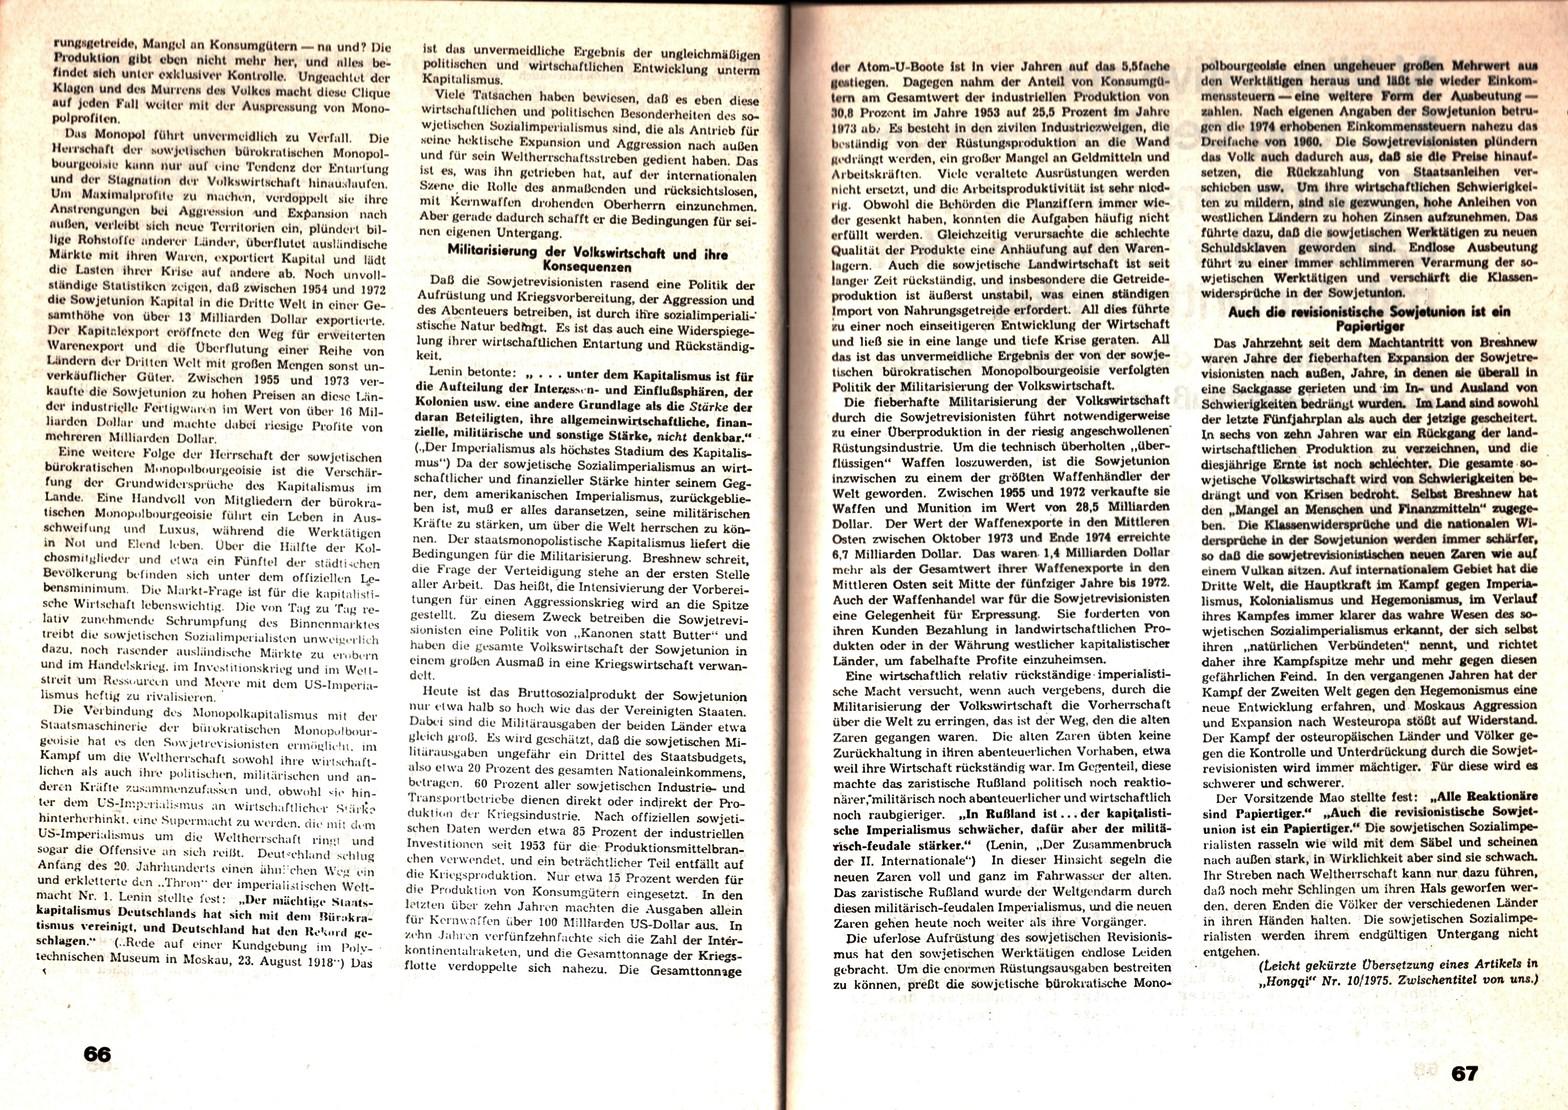 KSV_1976_Atomenergie_im_Kapitalismus_035